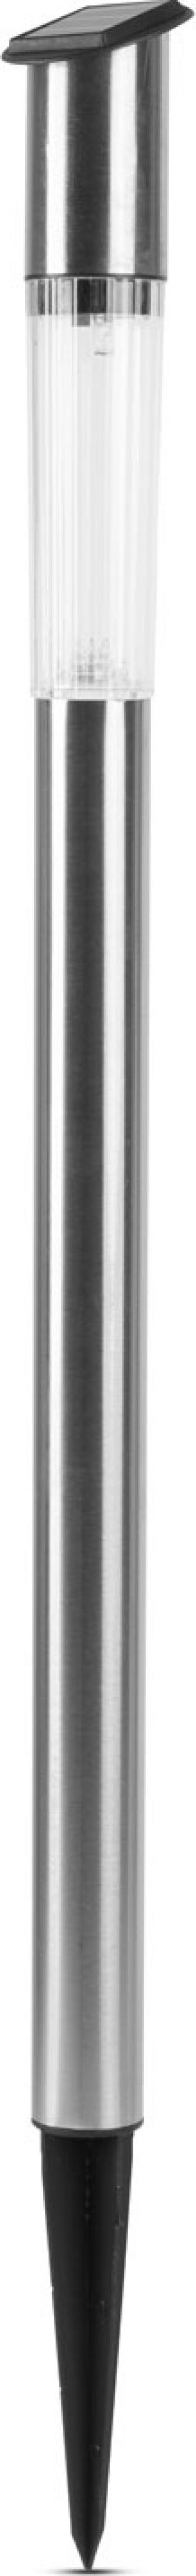 Lampa Solara LED tip Stalpisor Inalt din Metal Satinat Inaltime 70 cm Corpuri de iluminat